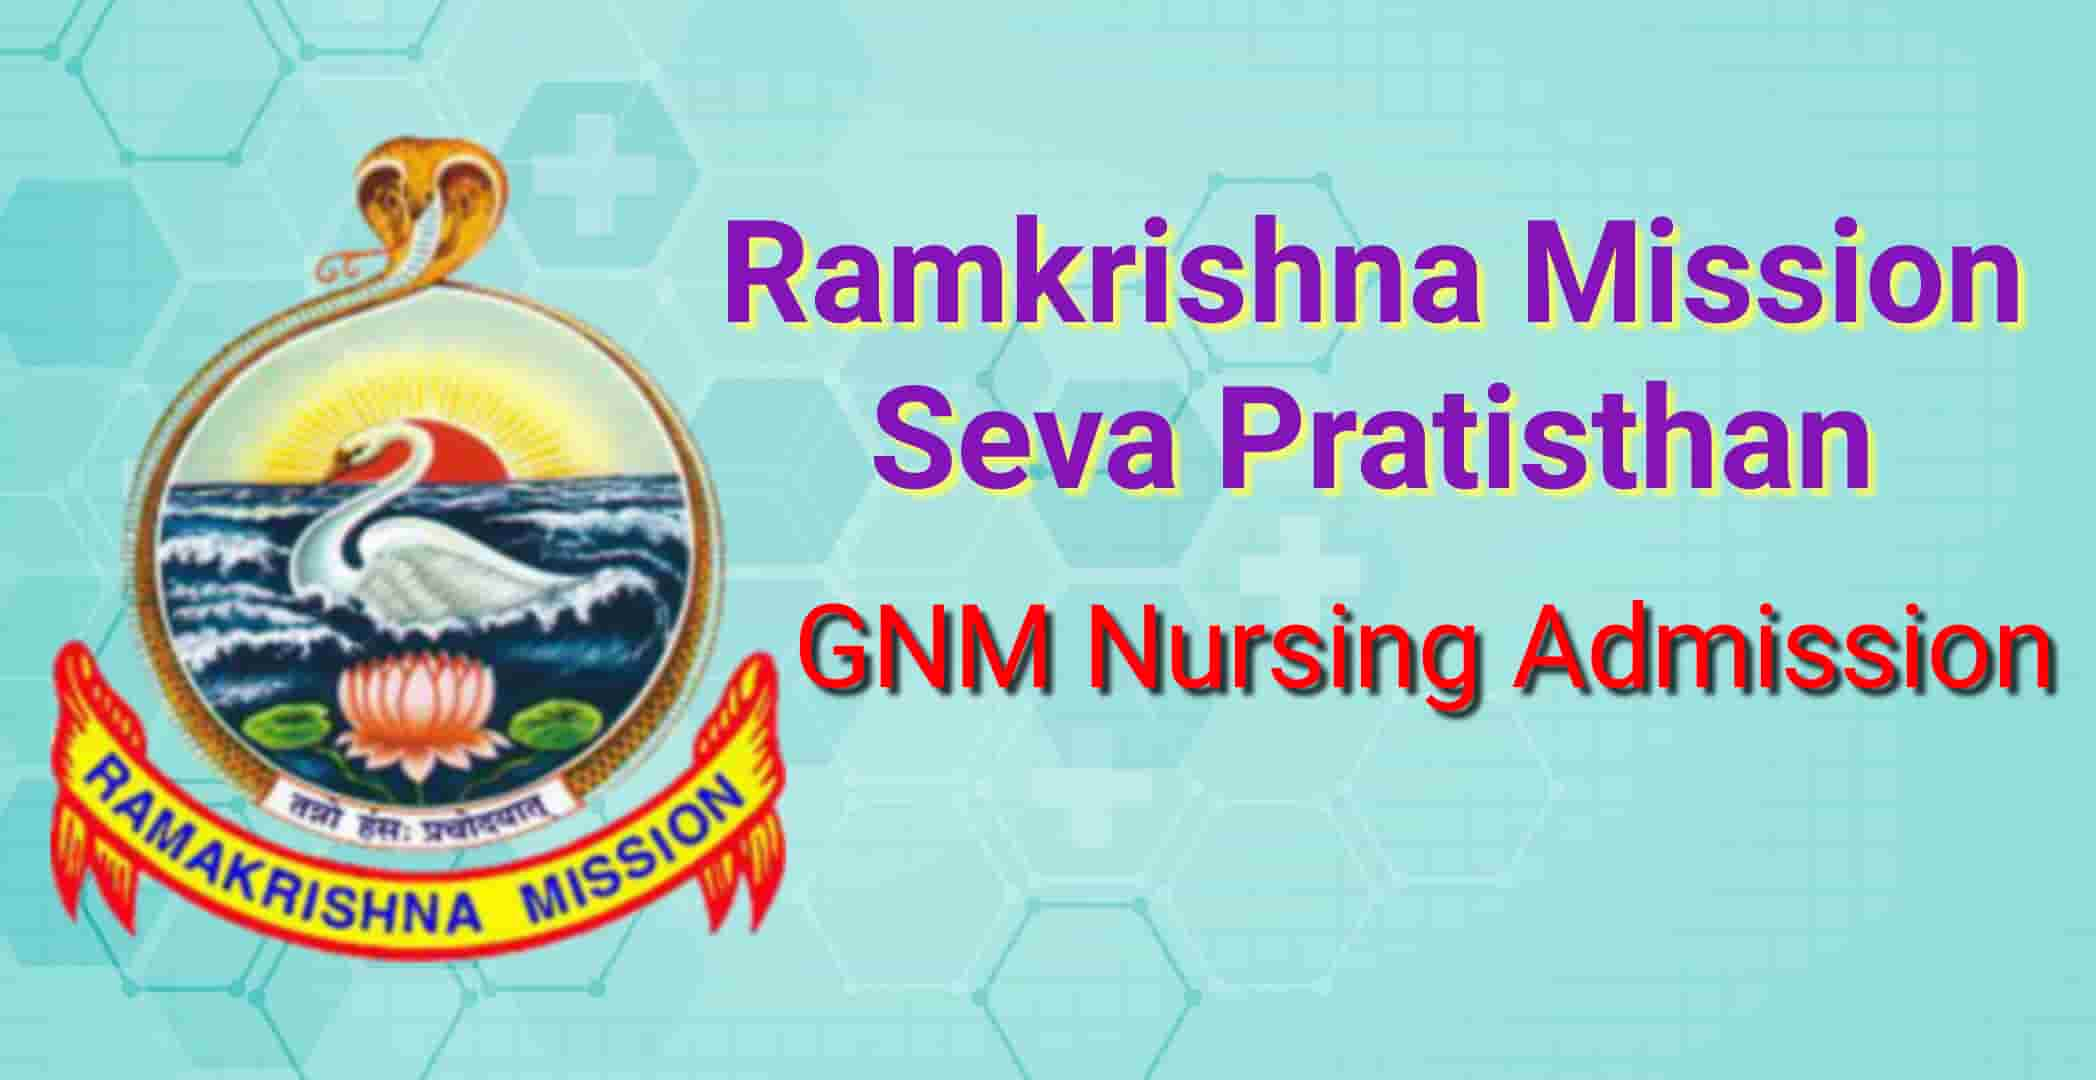 Ramakrishna Mission Seva Pratishthan GNM Nursing Admission 2020